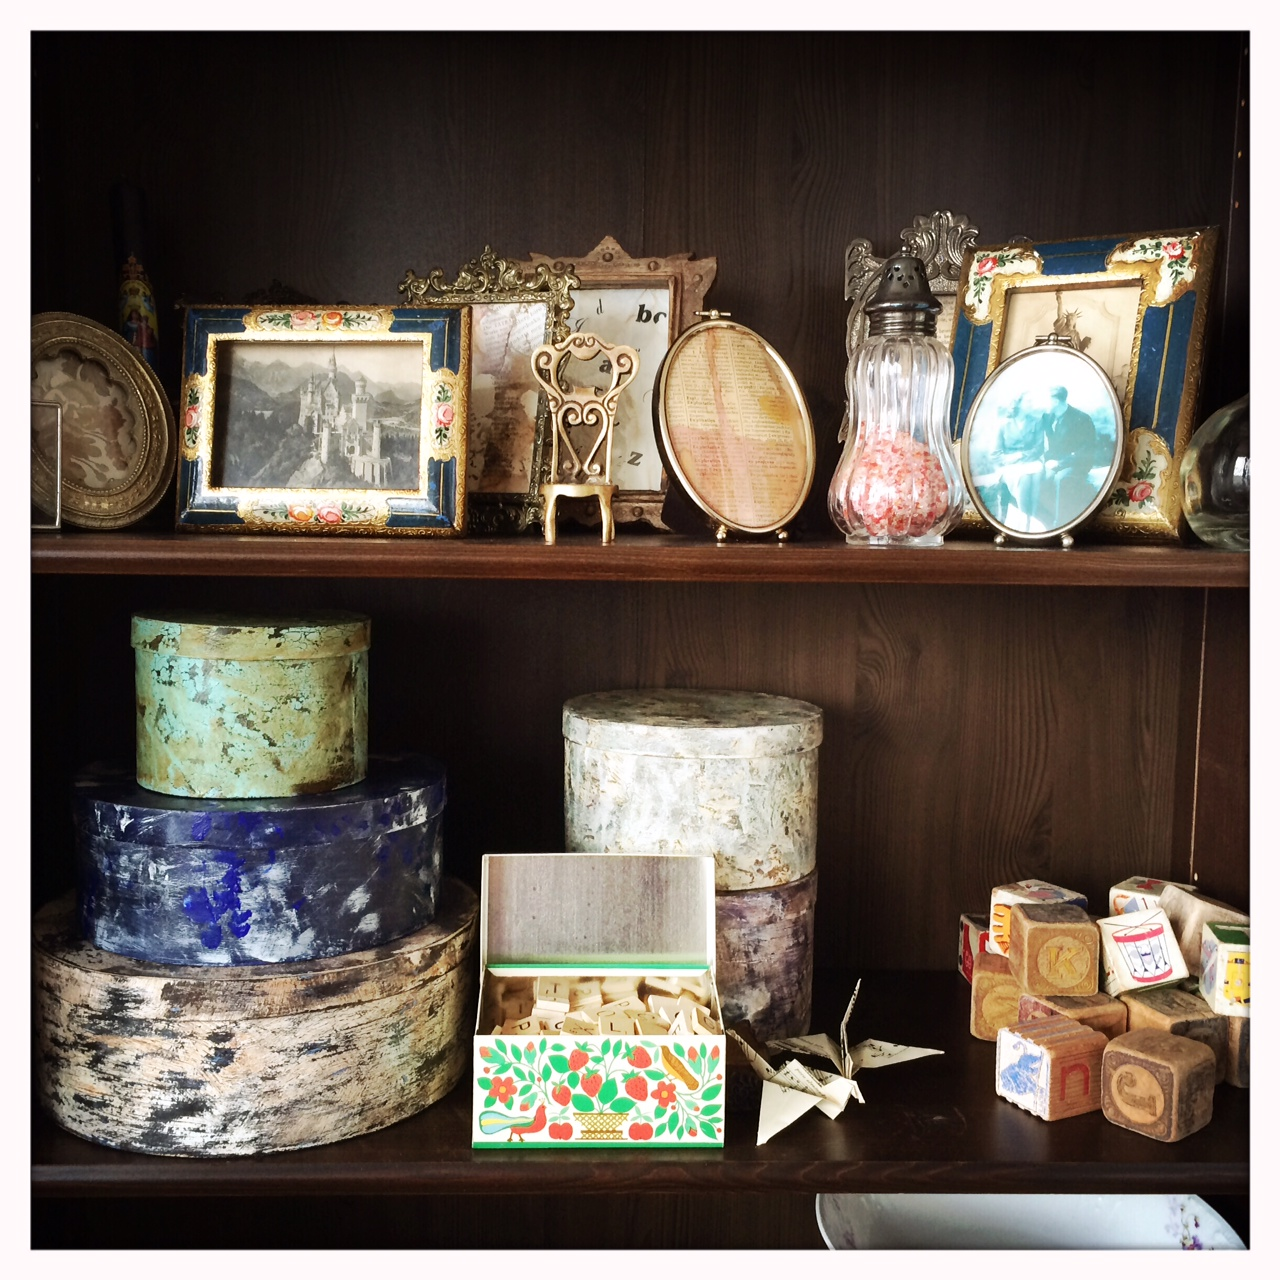 View of my shelf